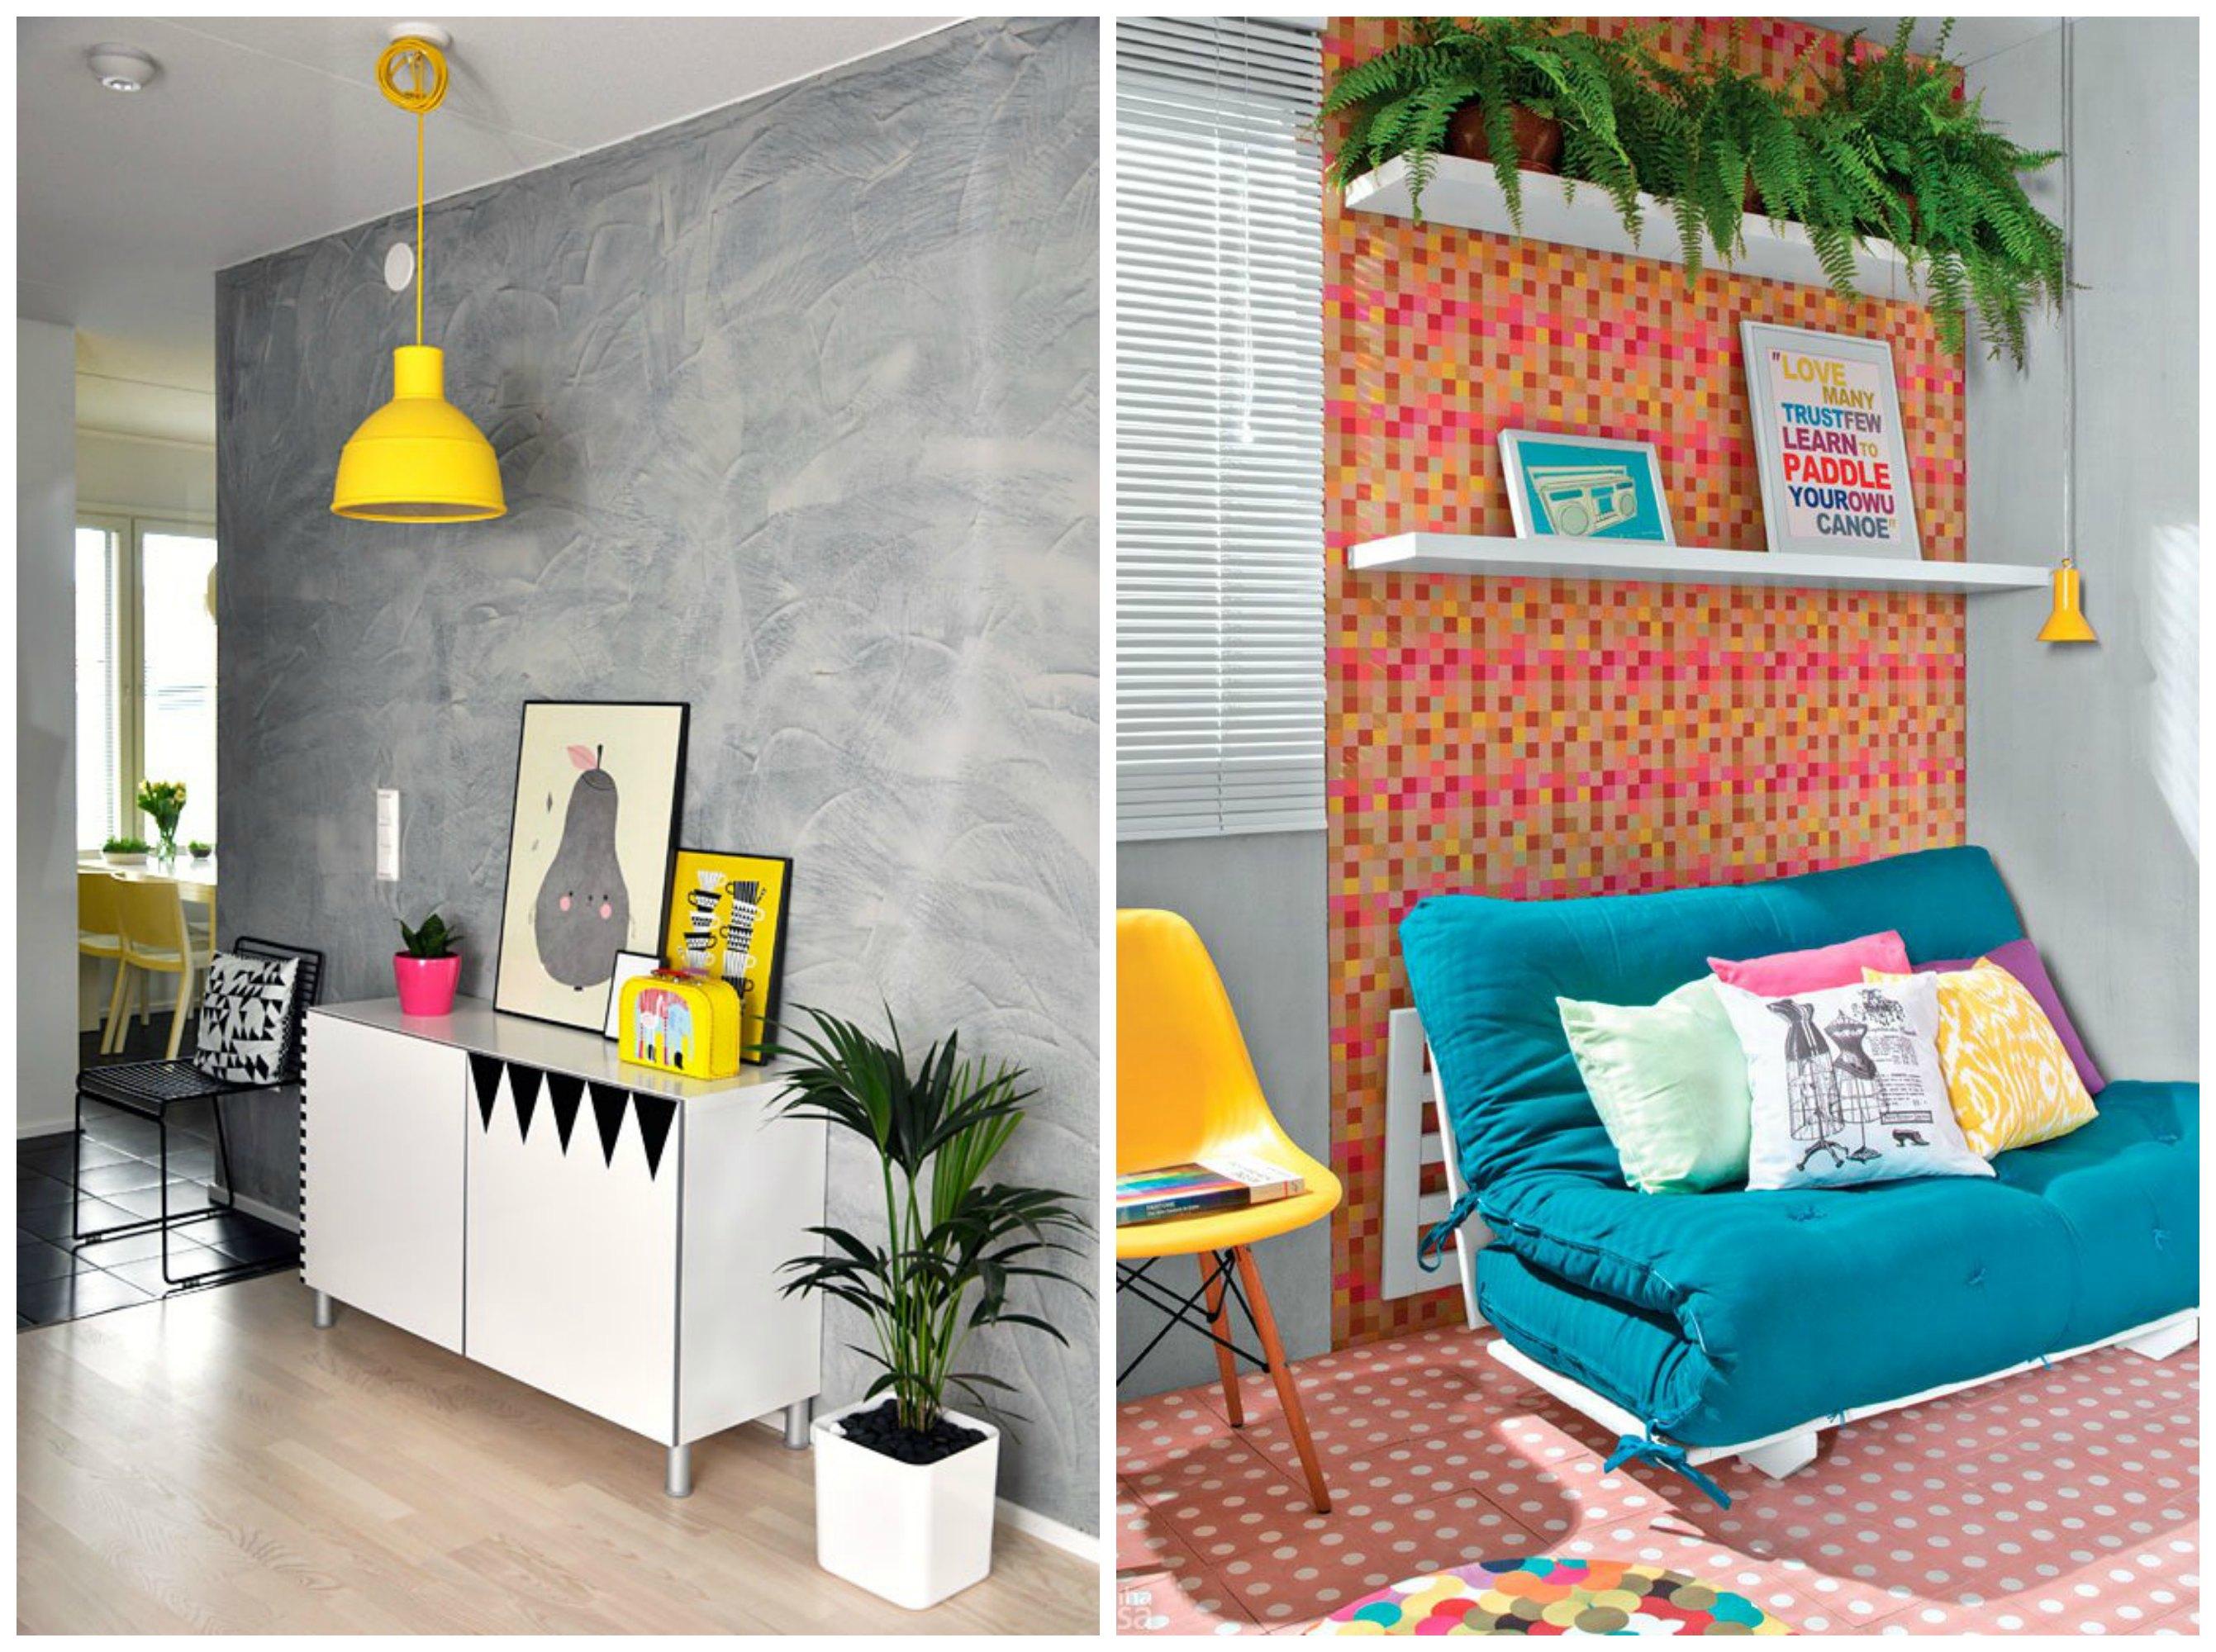 Diy living room decor pinterest